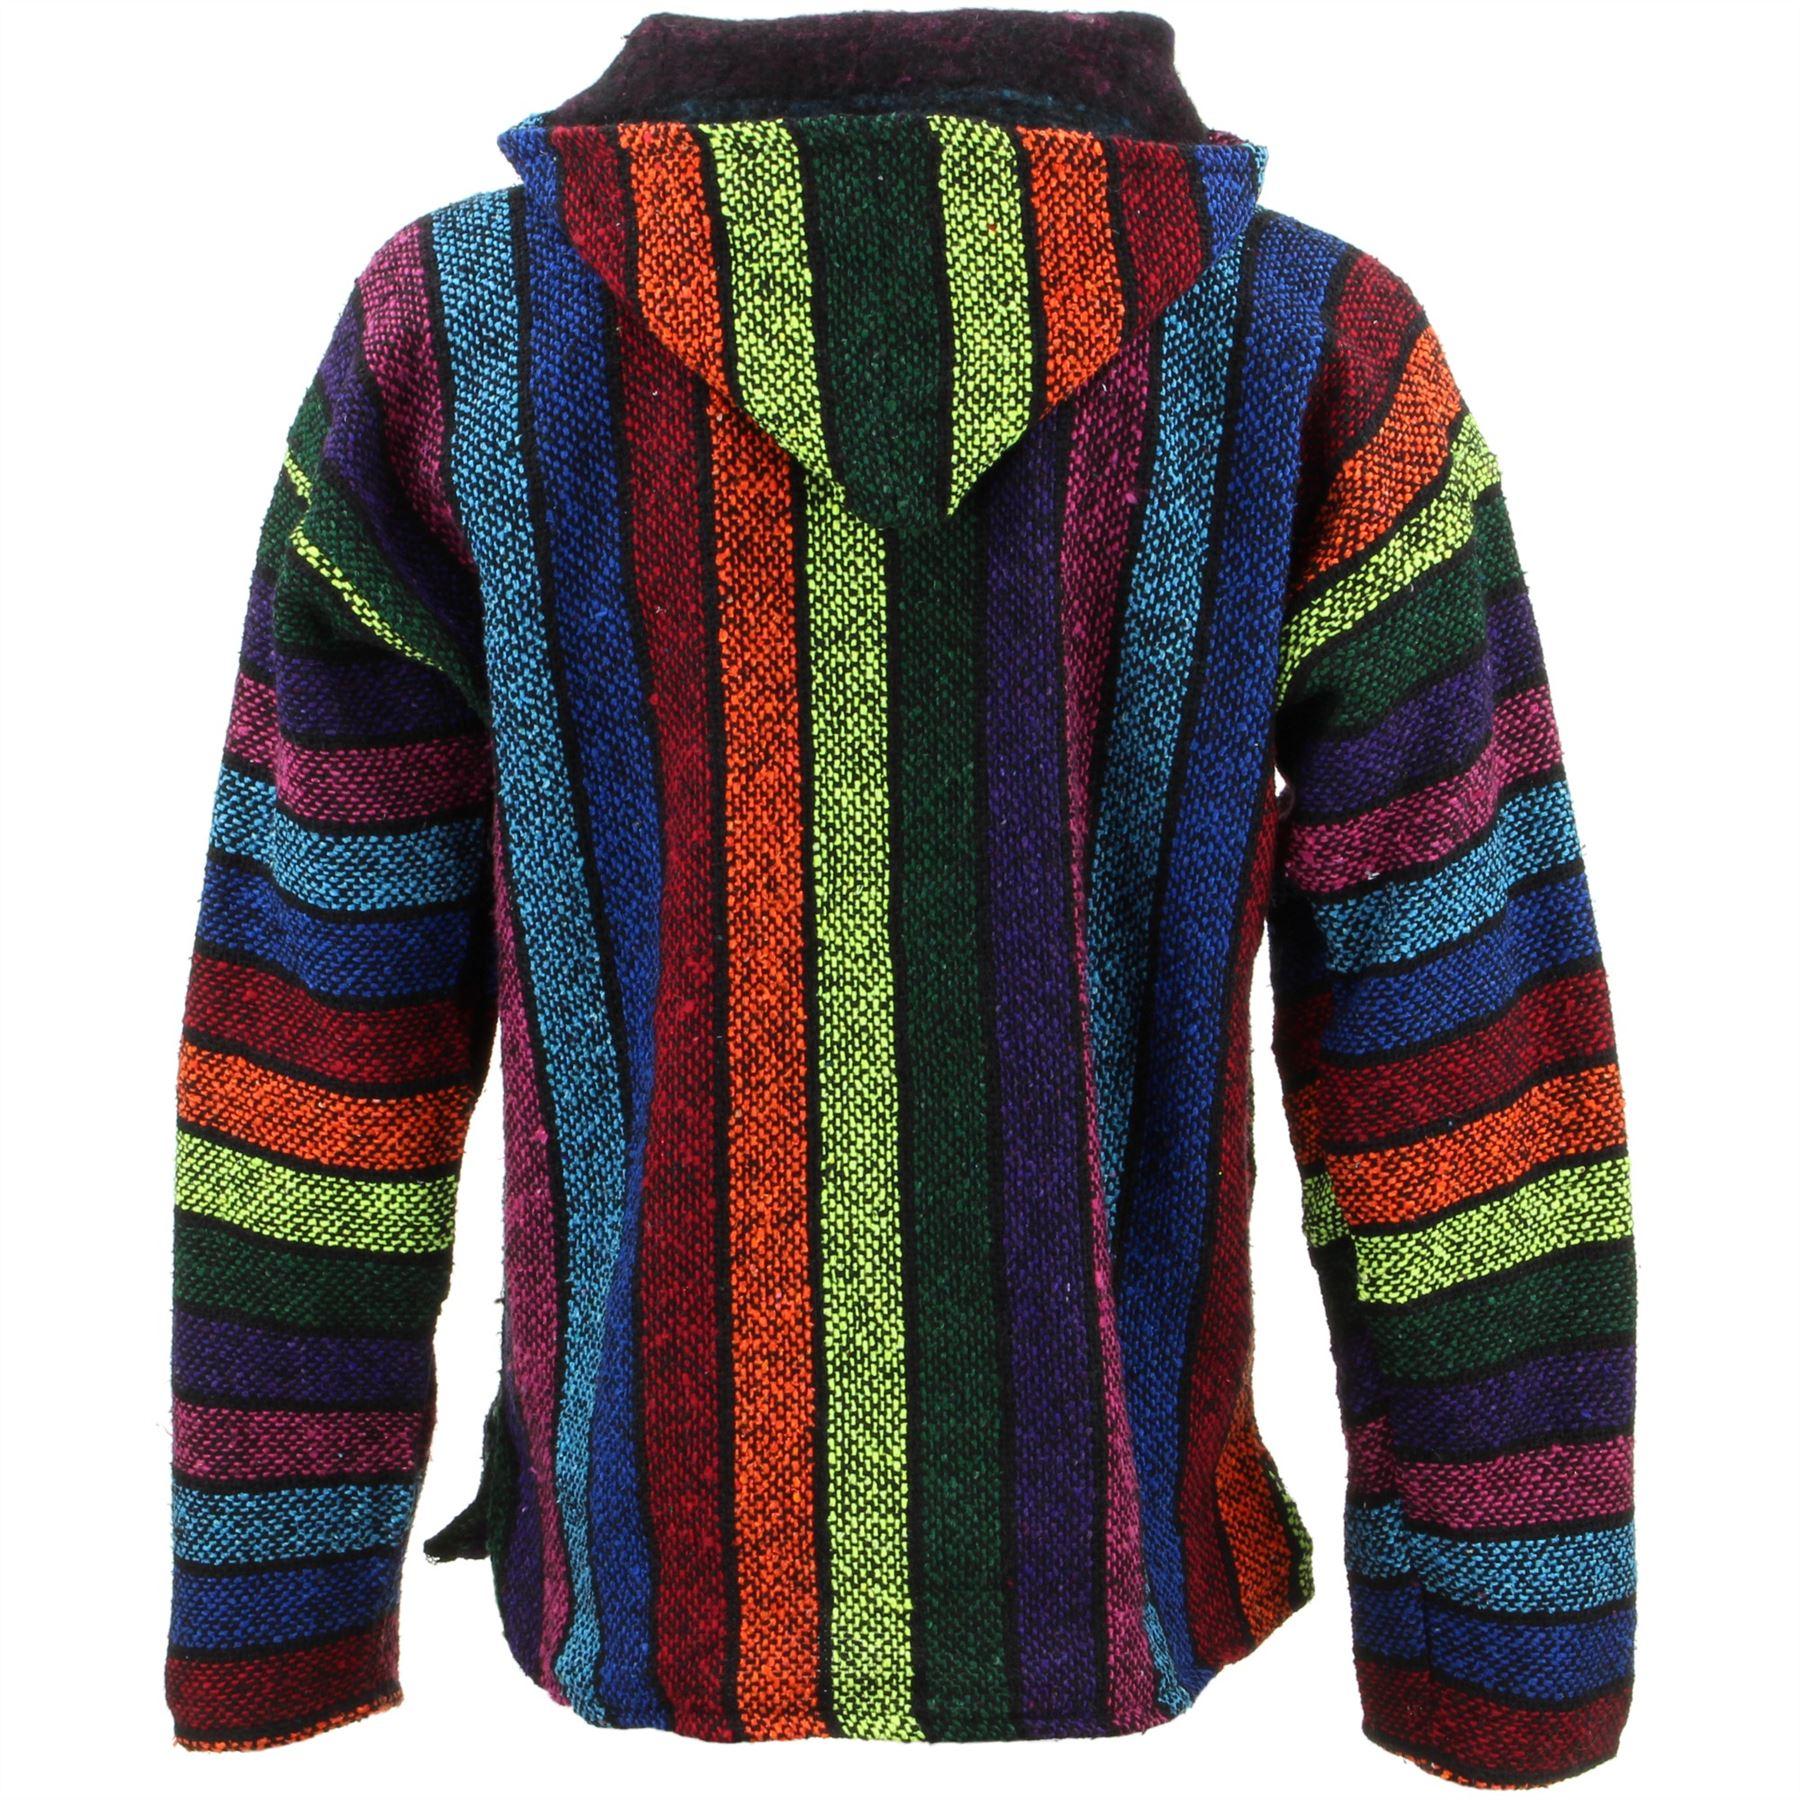 Mexican-Baja-Hoodie-Hoody-Jerga-Rug-Jumper-Siesta-Surf-Hippy-Baha-Pullover thumbnail 3